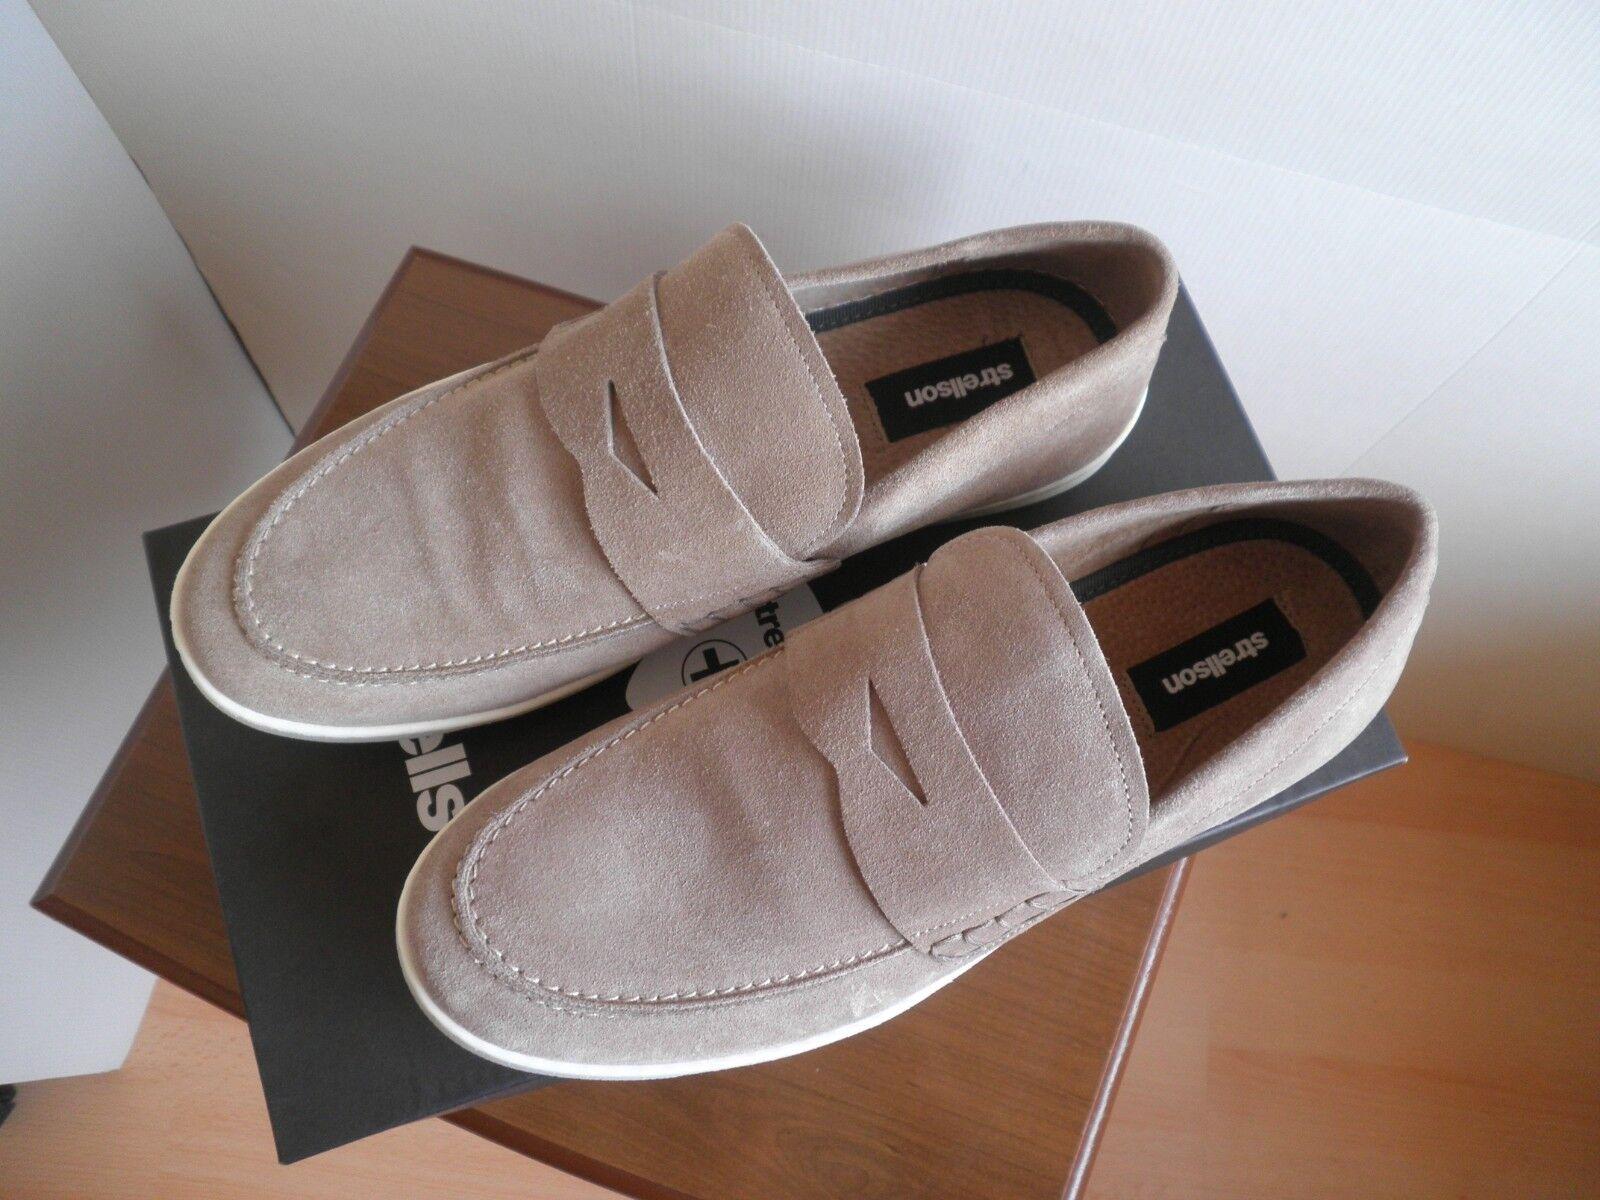 4ba4f79c295796 Strellson Schuhe Test Vergleich +++ Strellson Schuhe kaufen   sparen!